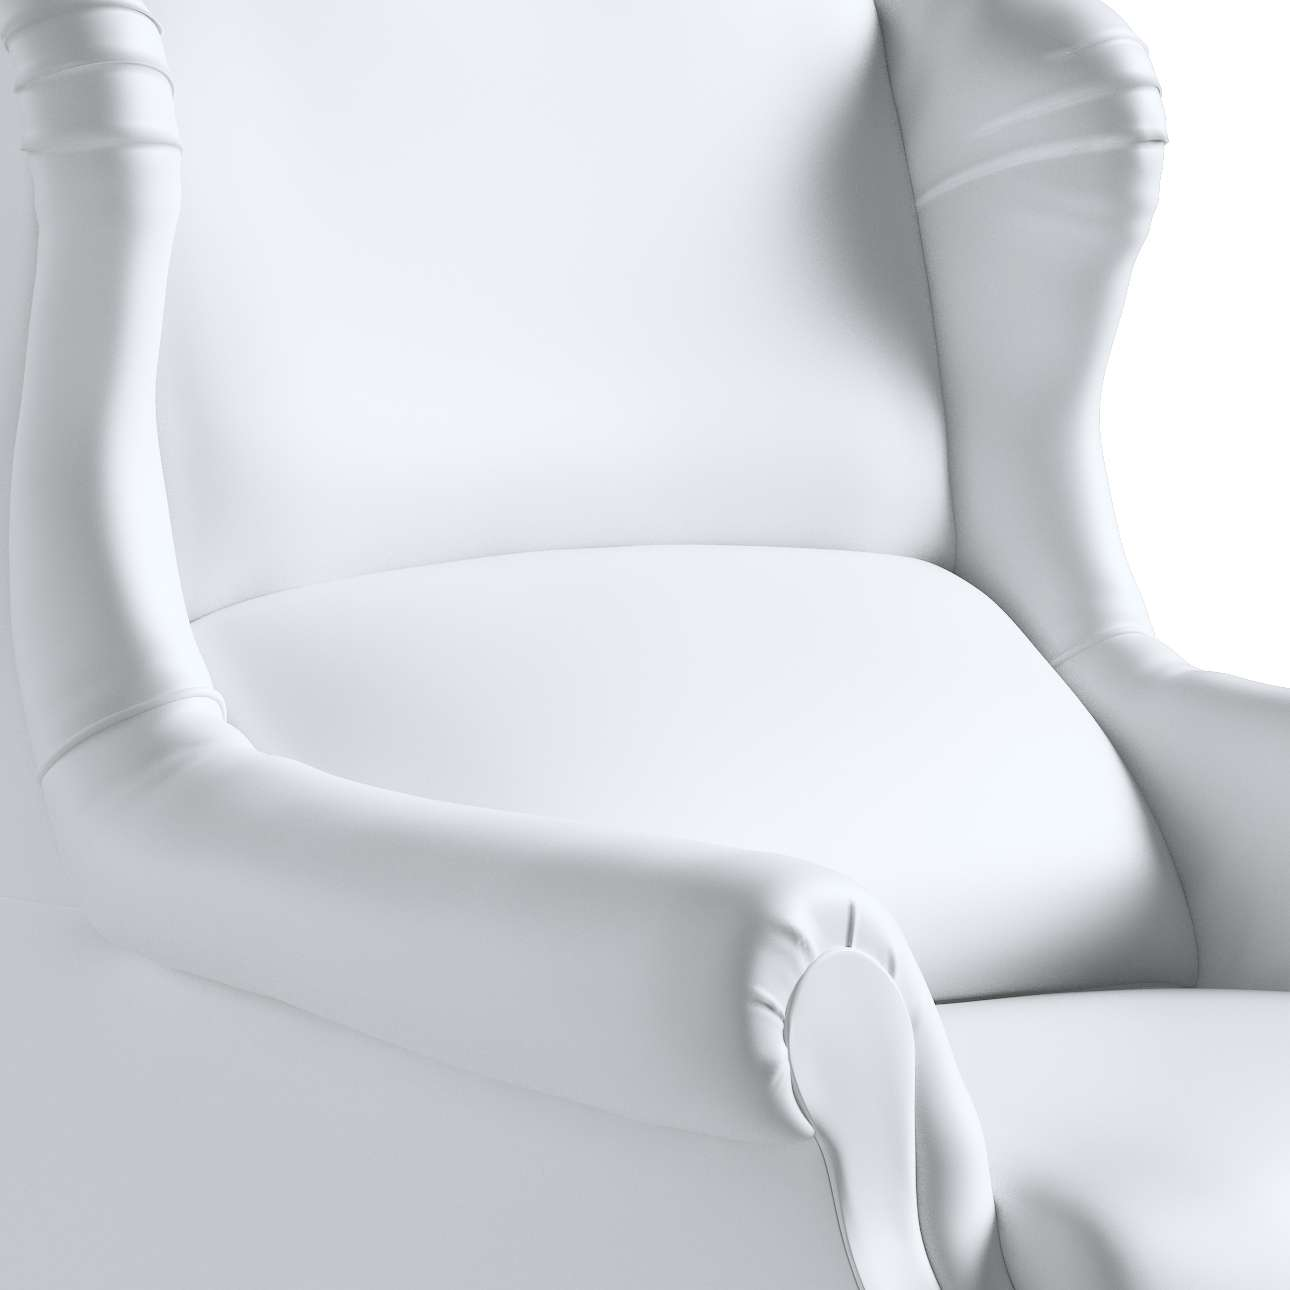 Fotel Unique w kolekcji Damasco, tkanina: 141-78